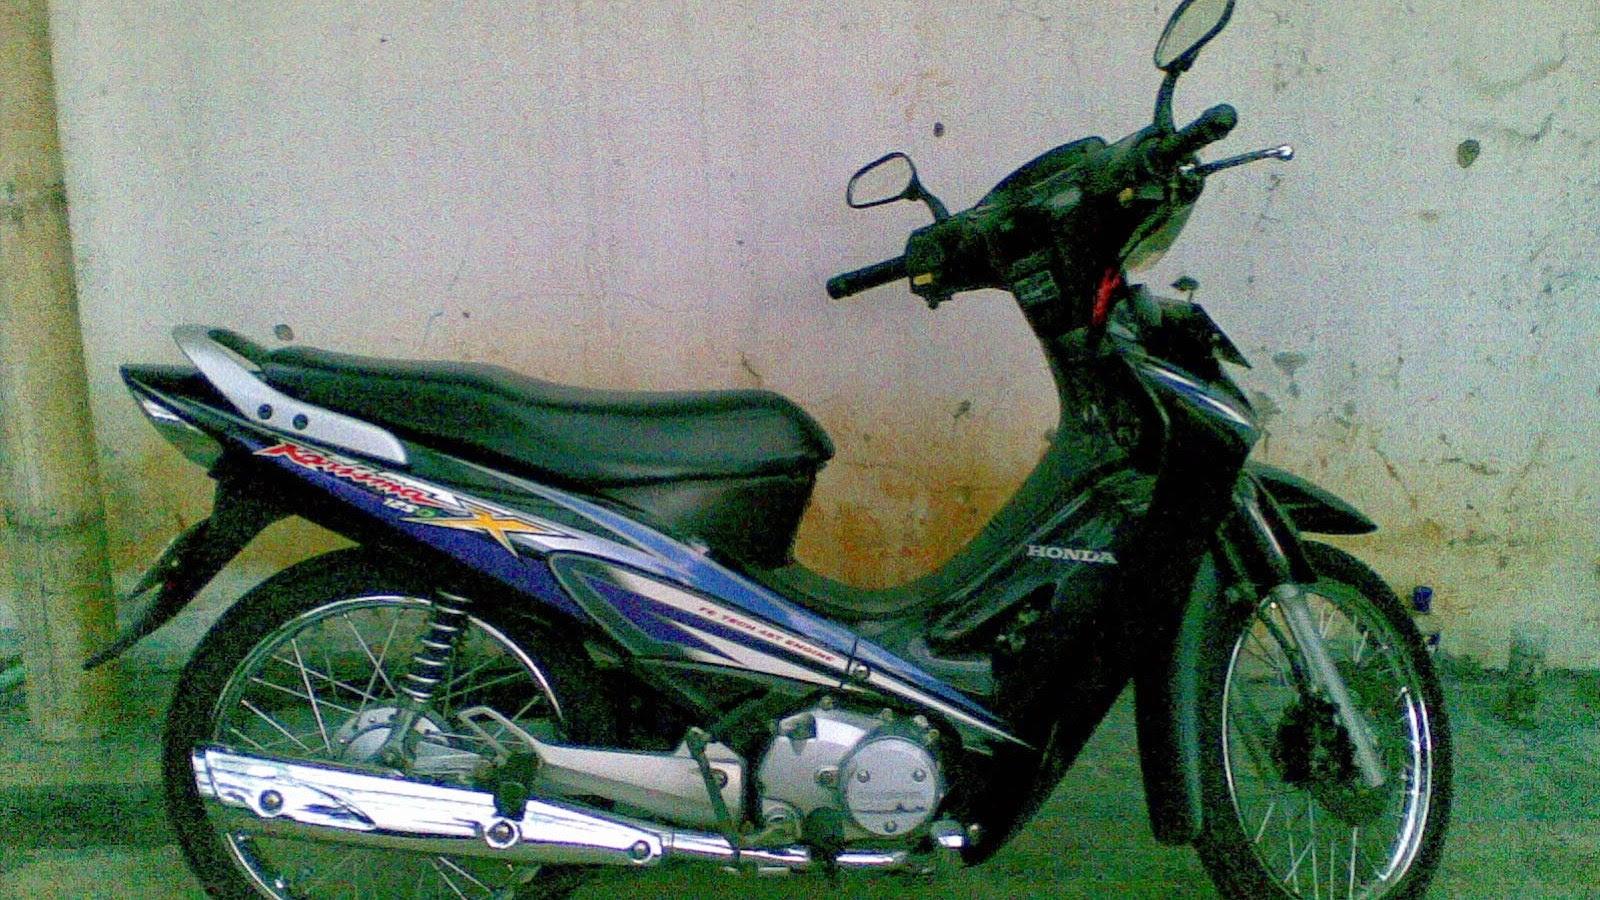 Modifikasi Motor Honda Karisma 125 Kumpulan Modifikasi Motor